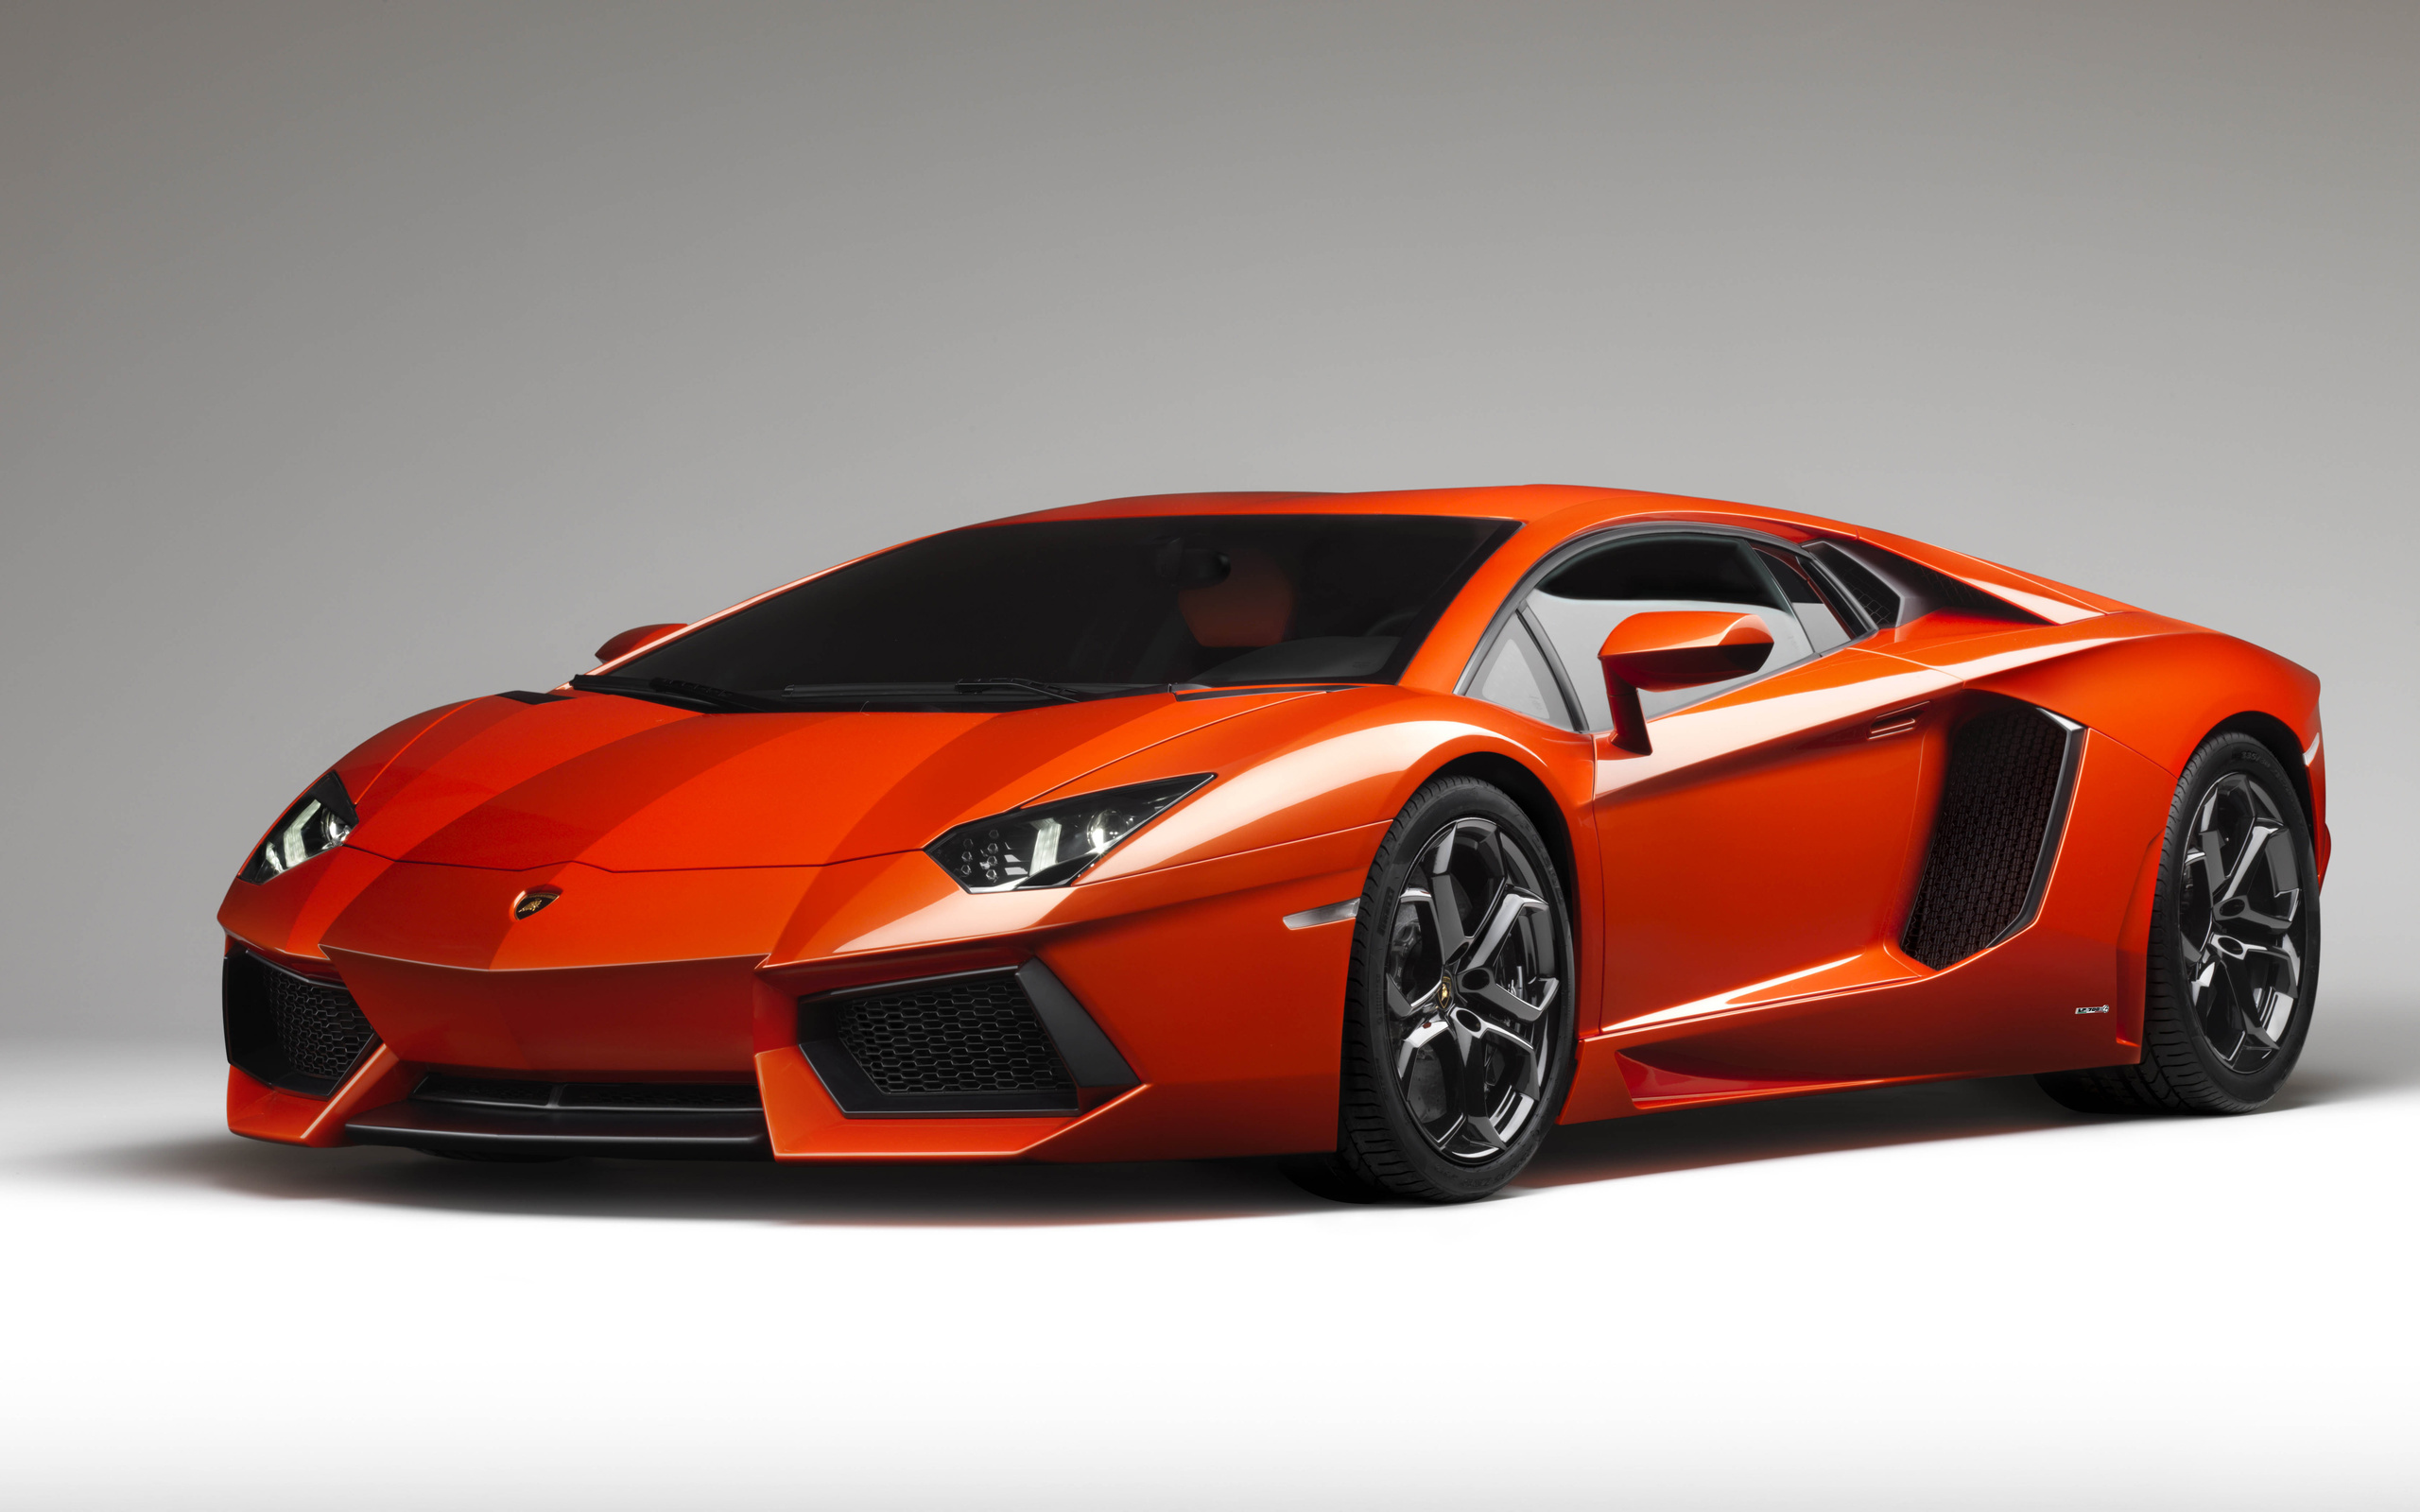 2012 Lamborghini Aventador LP700 4 Wallpapers HD Wallpapers 2560x1600